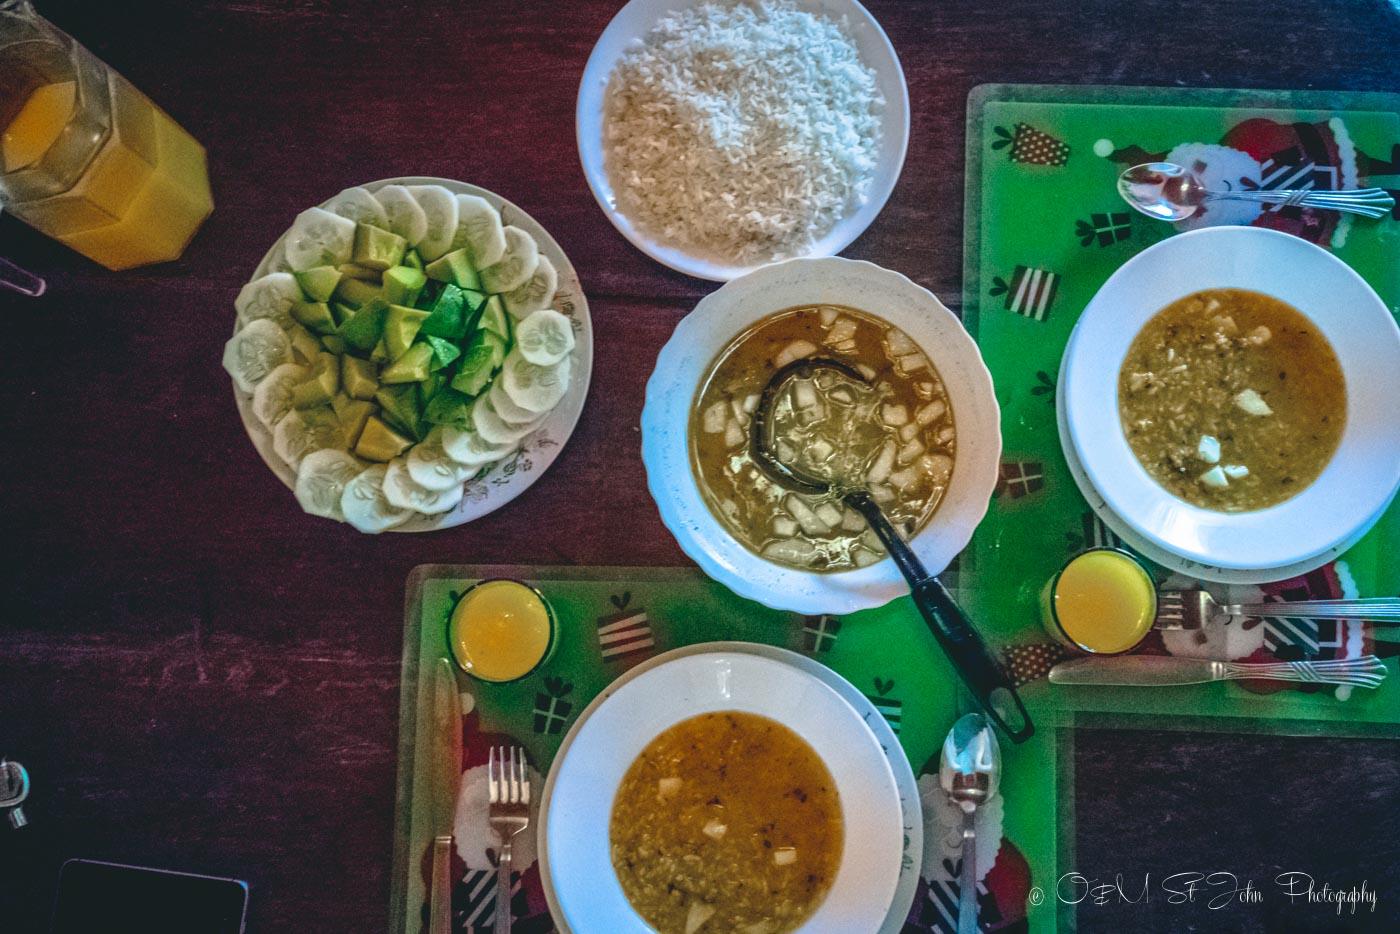 Delicious dinner meal at our Casa Particular in Cienfuegos, Cuba